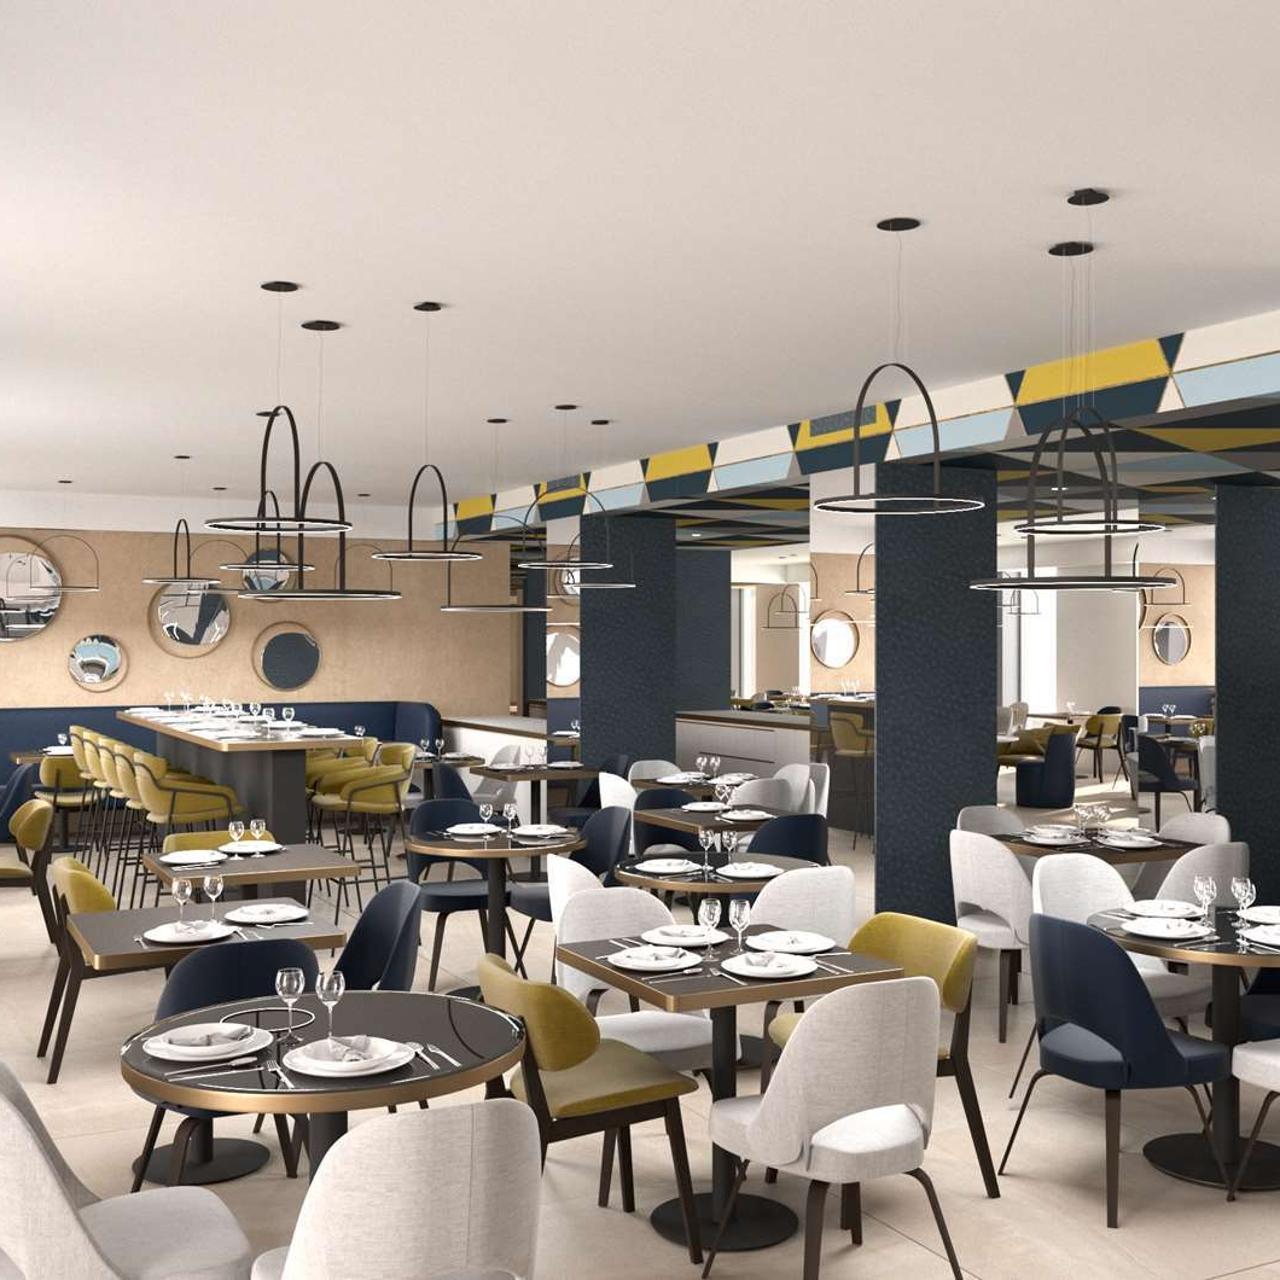 Hotel Nh Venezia Rio Novo Italy At Hrs With Free Services